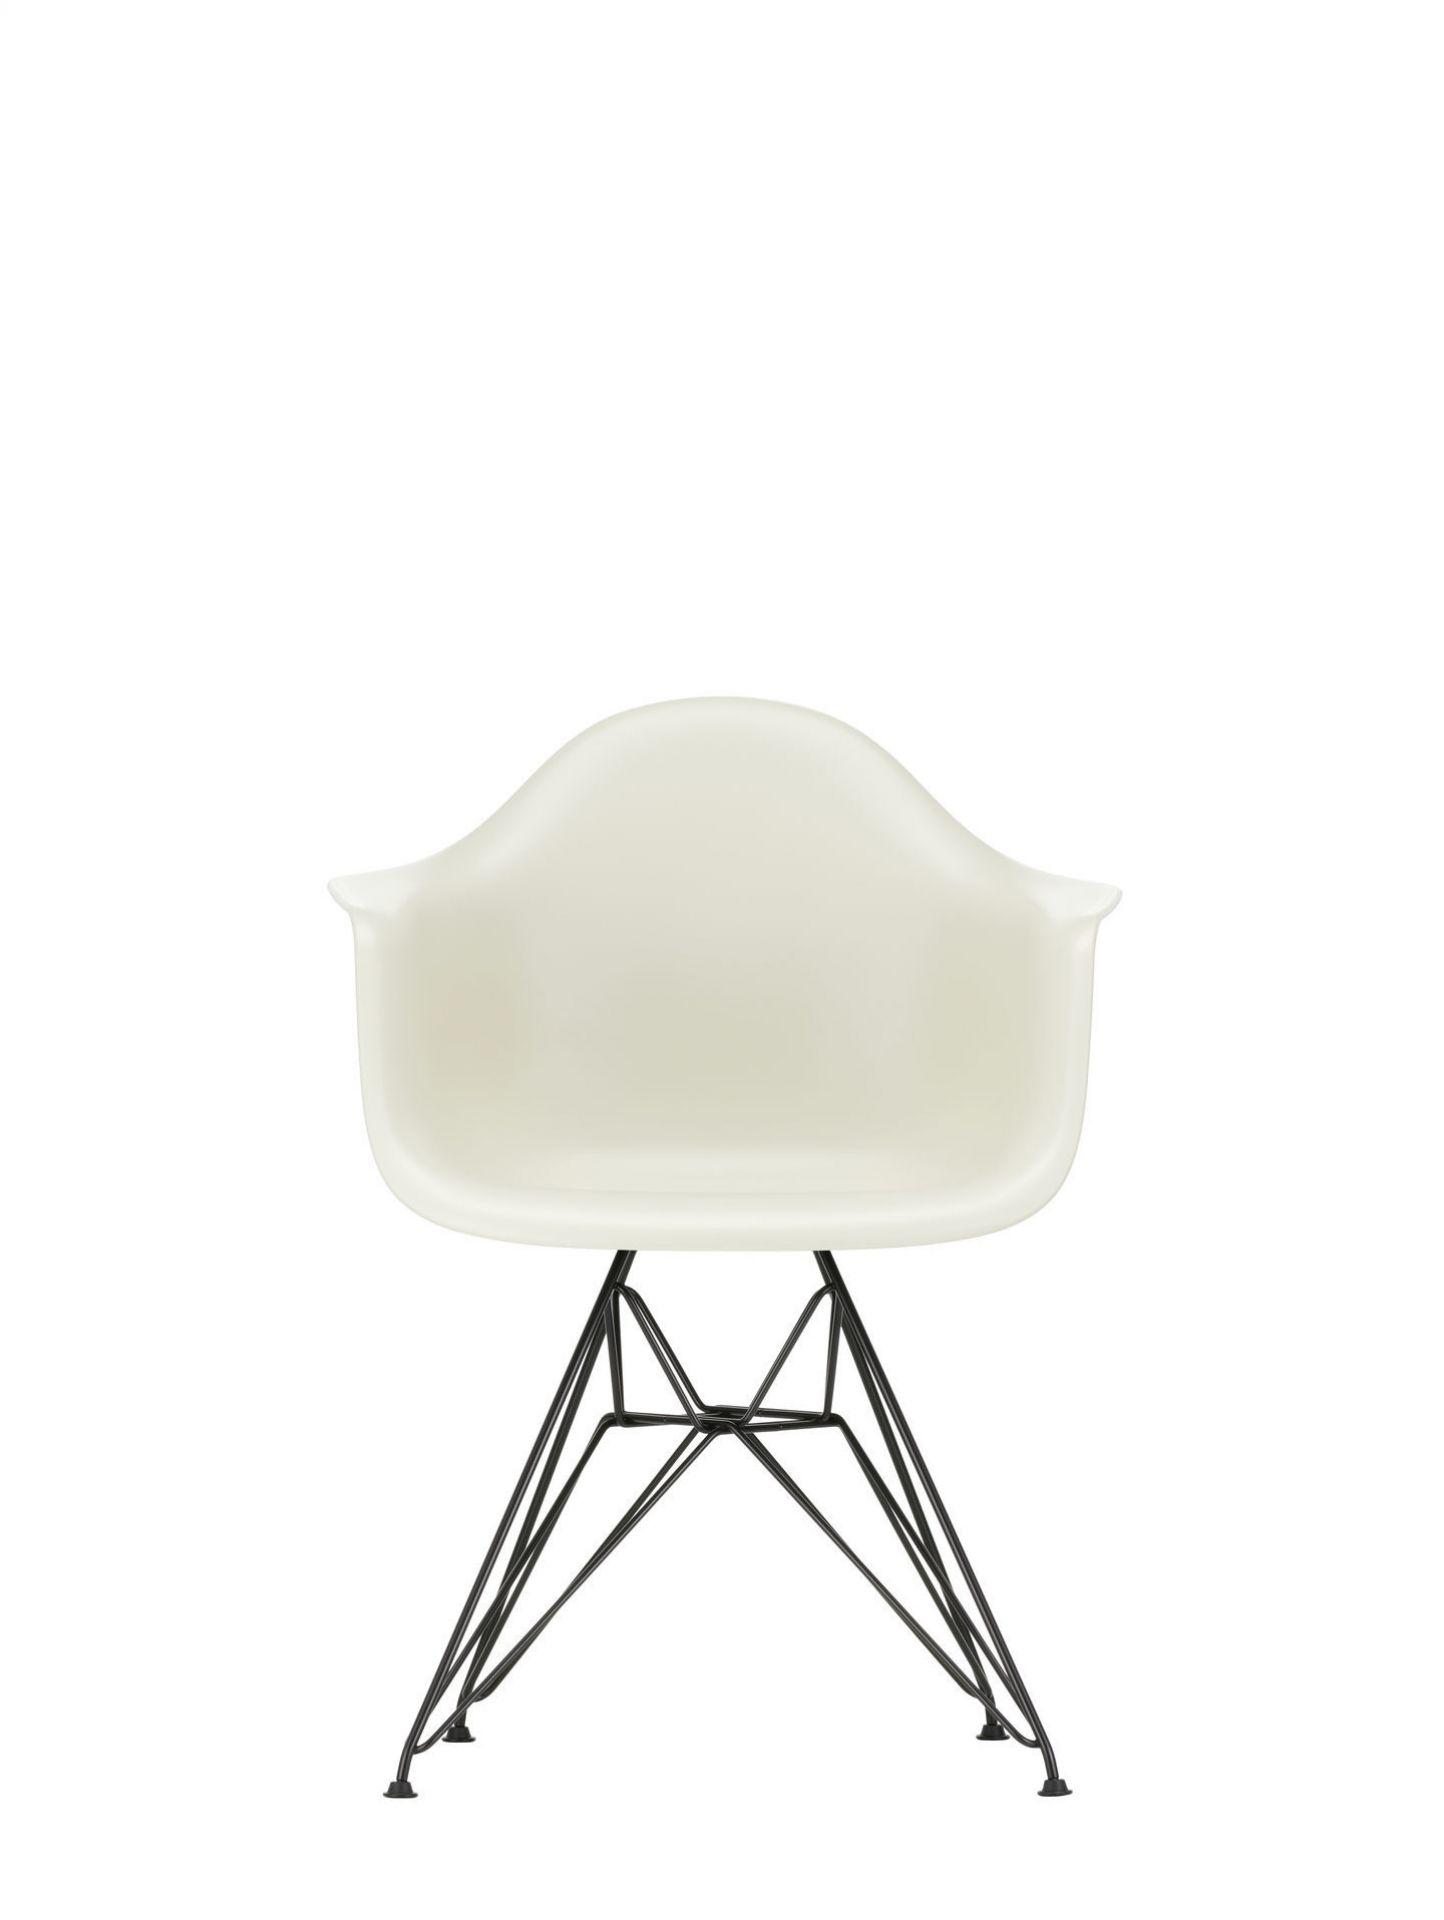 Eames Plastic Arm Chair DAR Stuhl Vitra Schwarz - Weiss